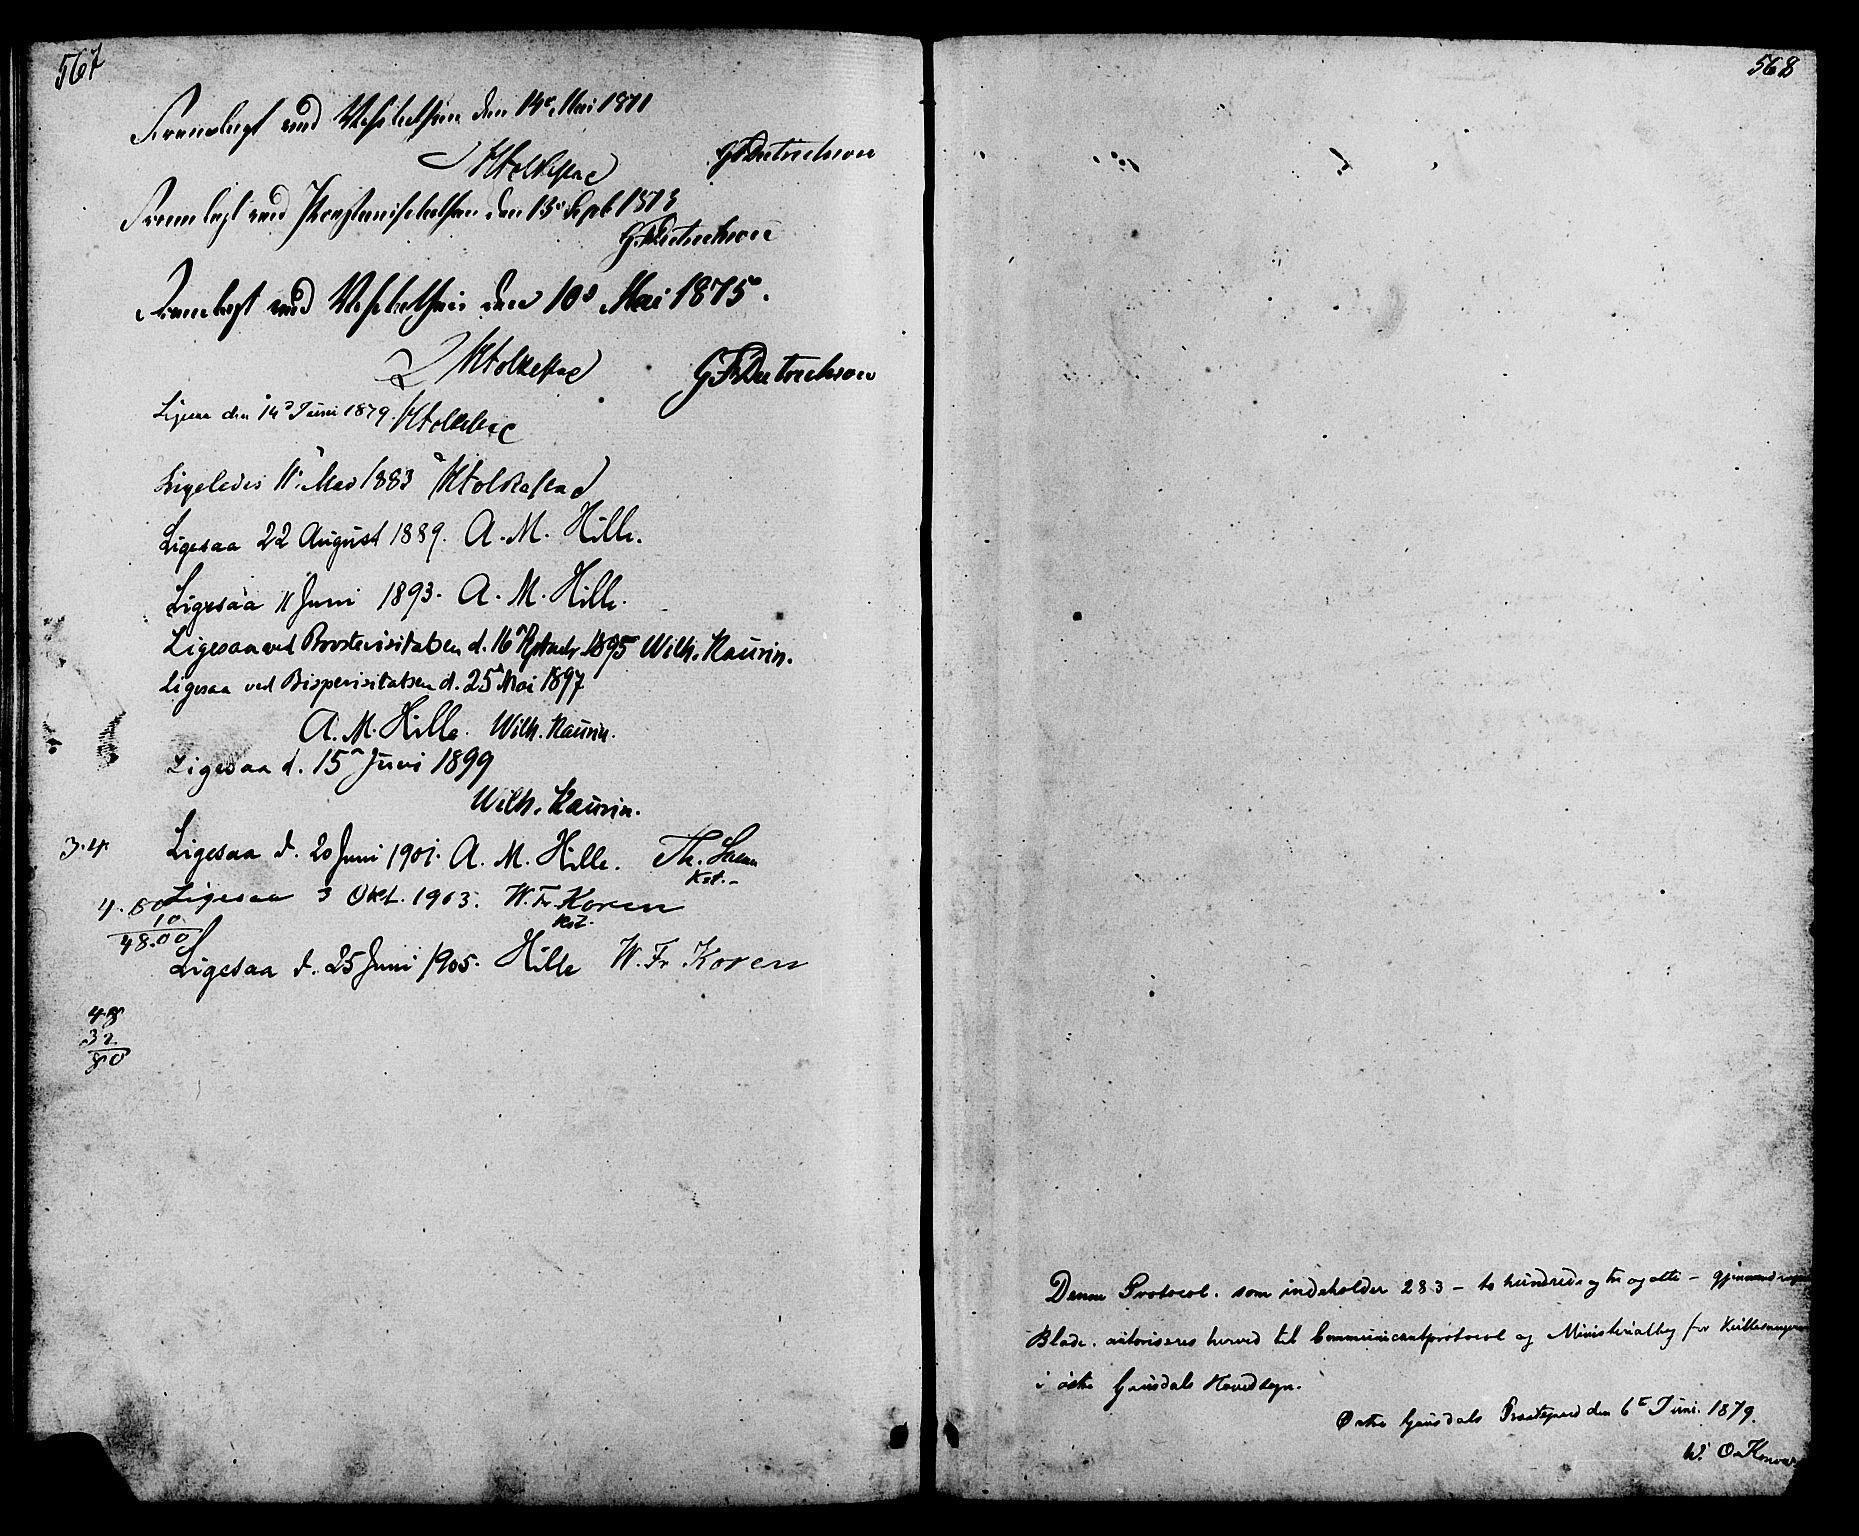 SAH, Østre Gausdal prestekontor, Klokkerbok nr. 1, 1863-1893, s. 567-568